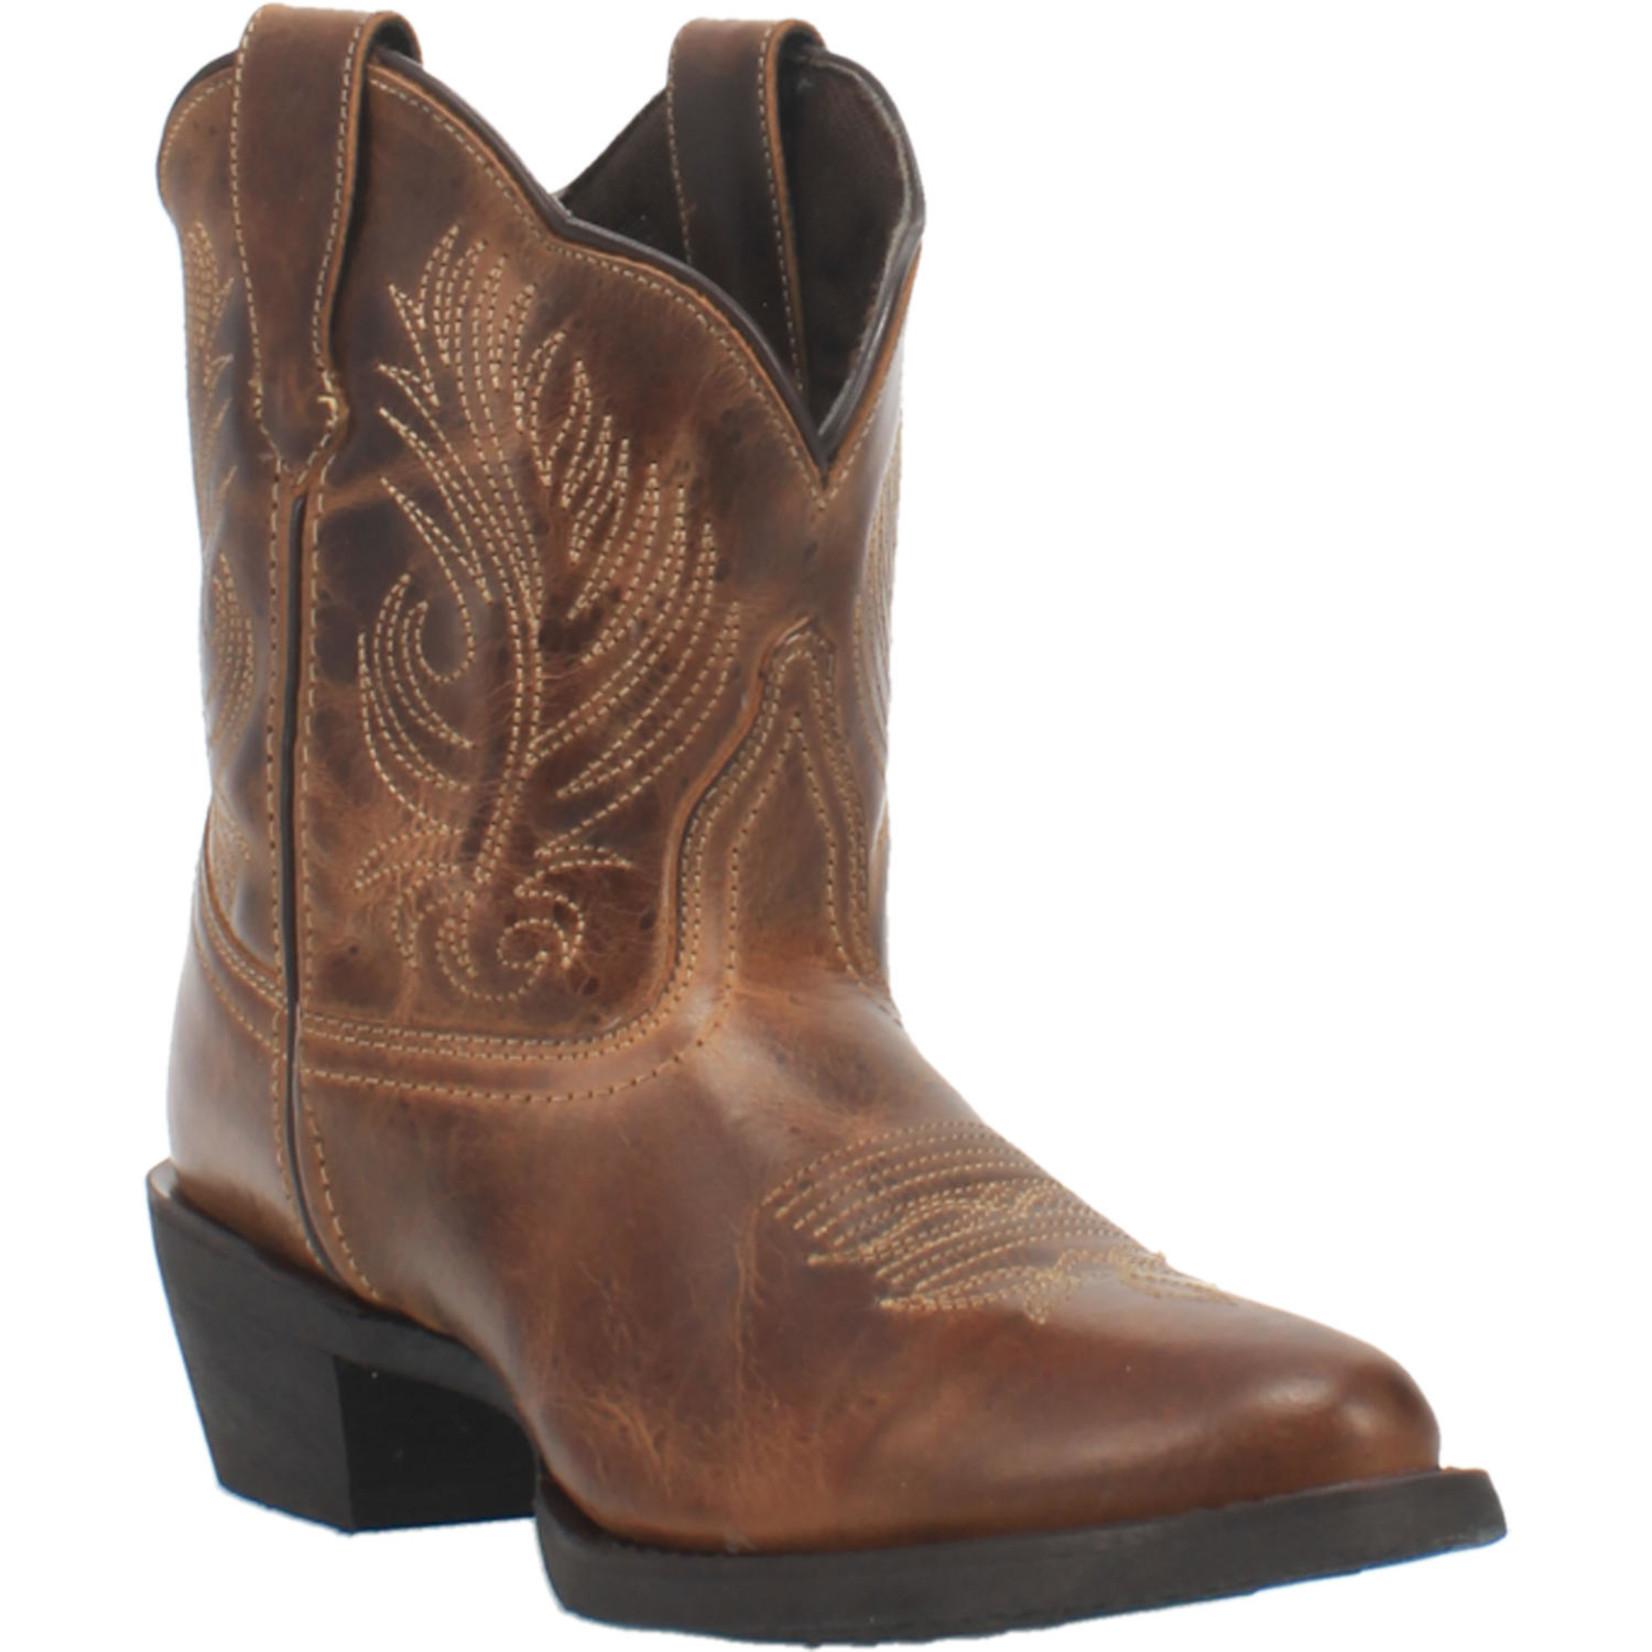 Laredo Women's Laredo tori Cowgirl Boot Brown 51044